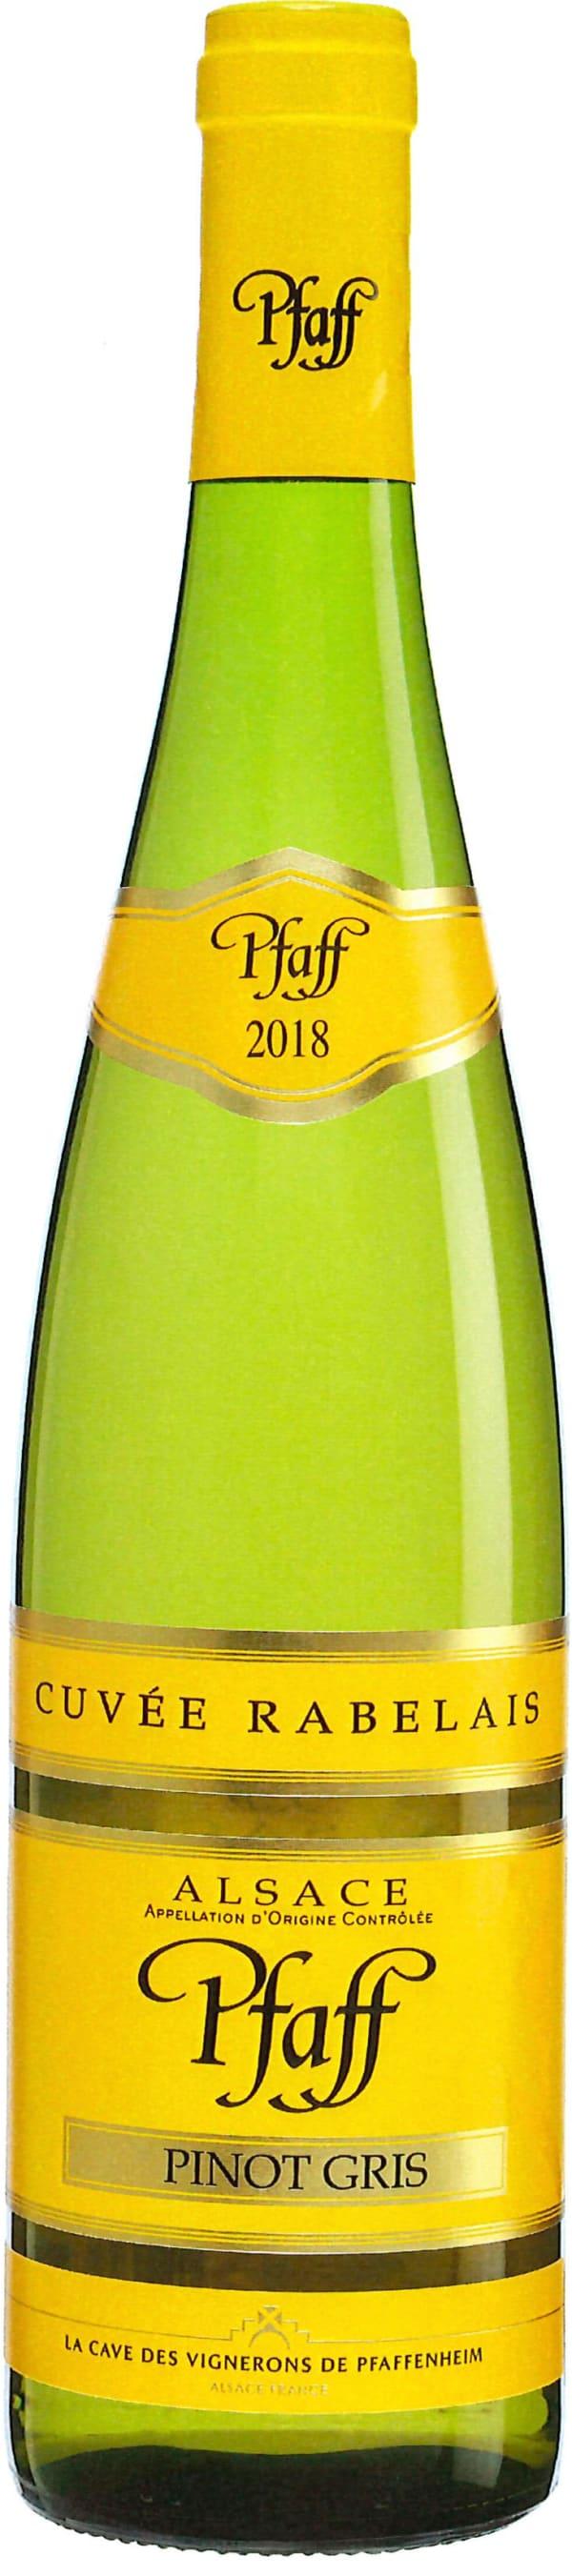 Pfaff Pinot Gris Cuvee Rabelais 2019